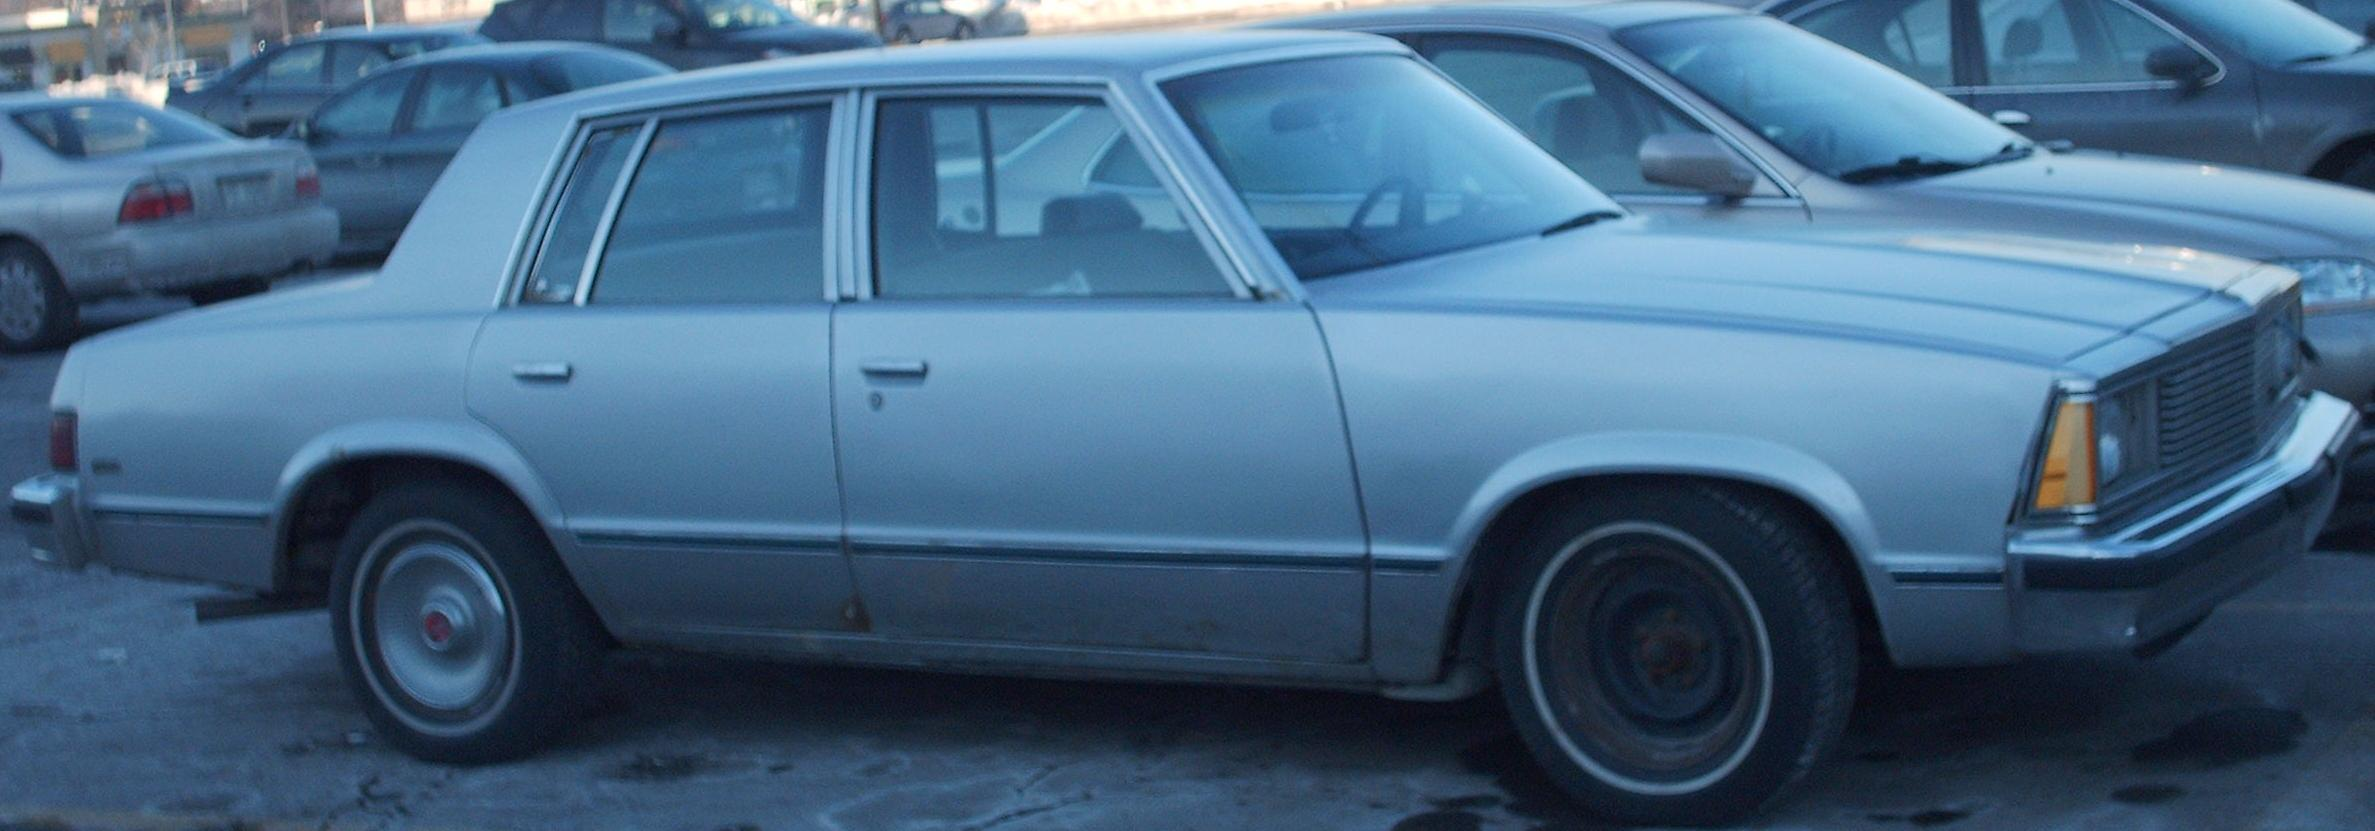 Chevrolet Malibu 1981 foto - 3